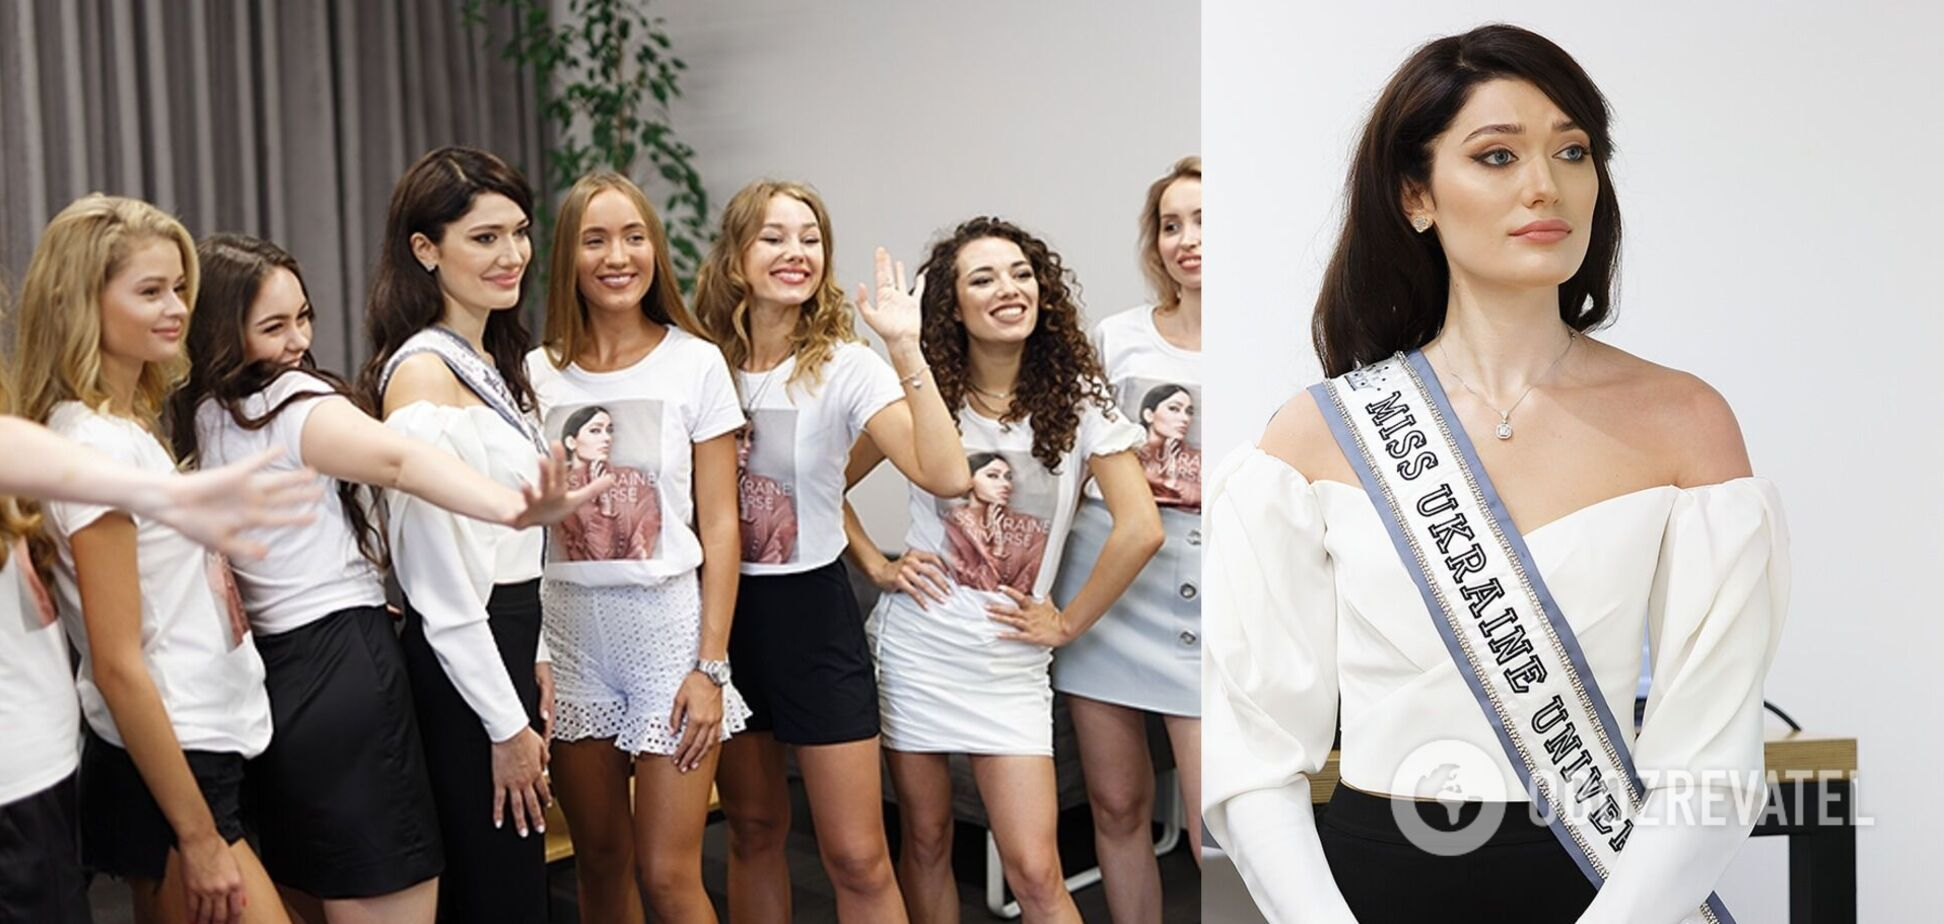 Как выглядят претендентки на титул 'Мисс Украина Вселенная'. Фото